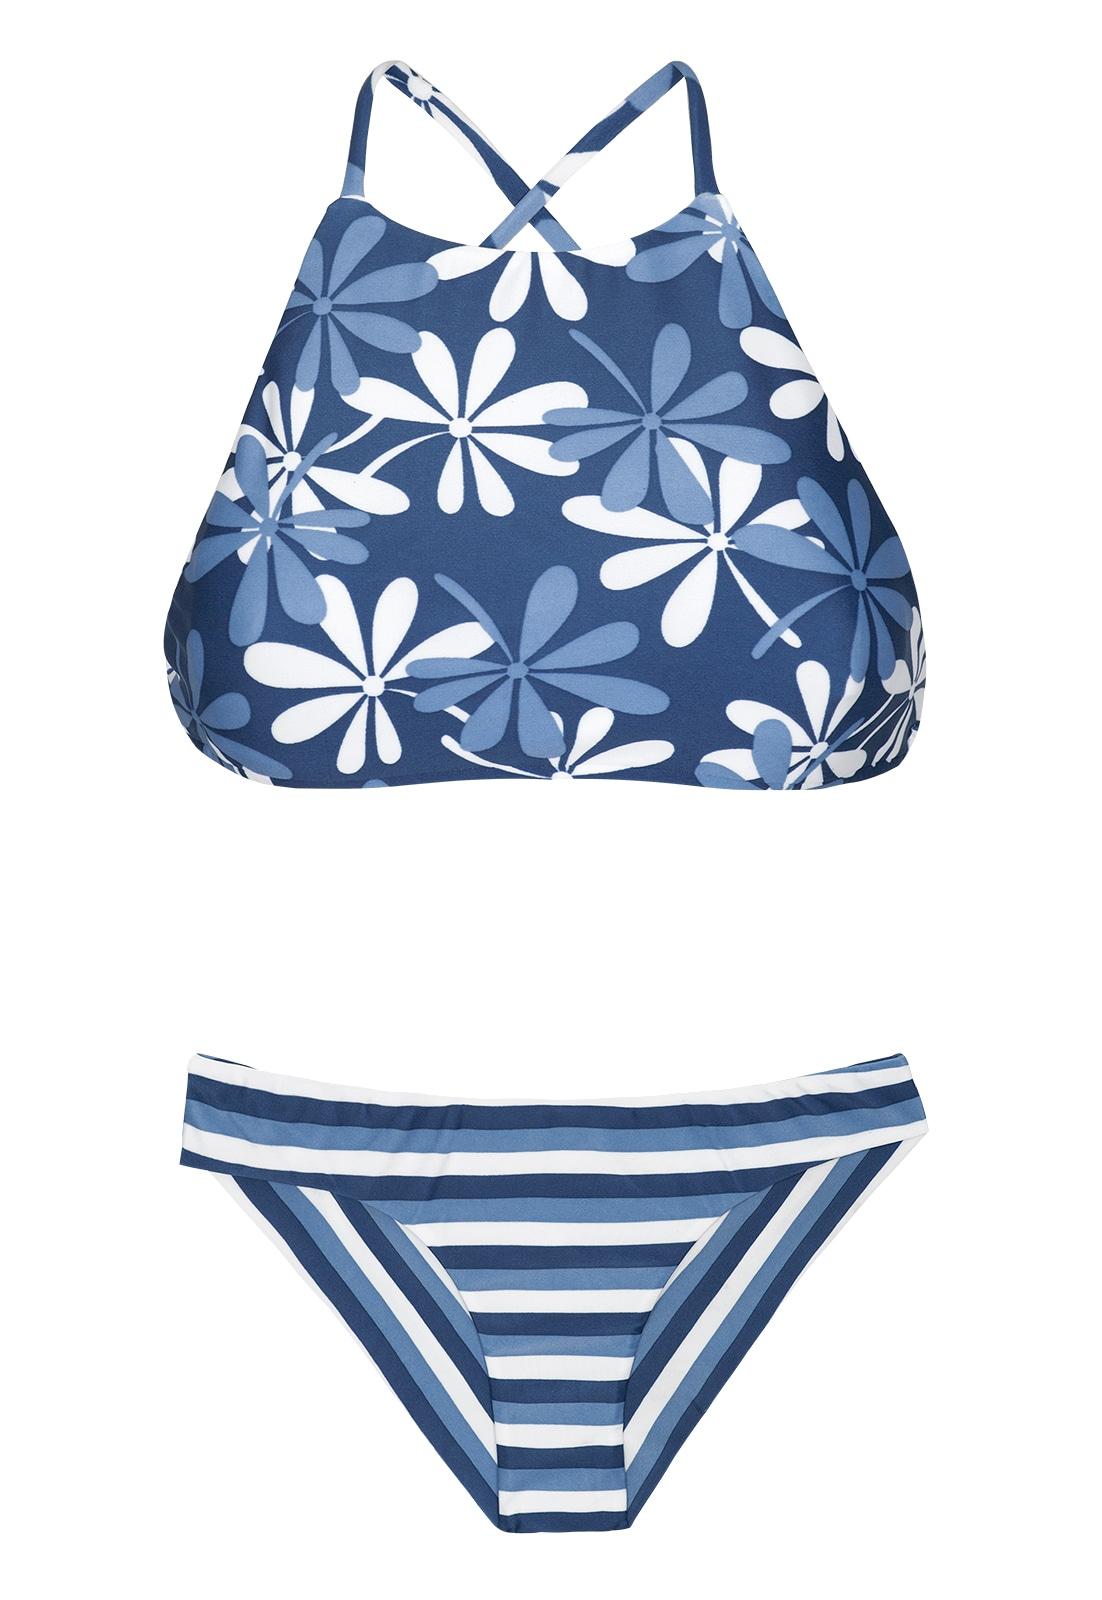 55d3faee154 Bikini Gestreepte En Gebloemde Gecropte Bikini - Maresia Sporty